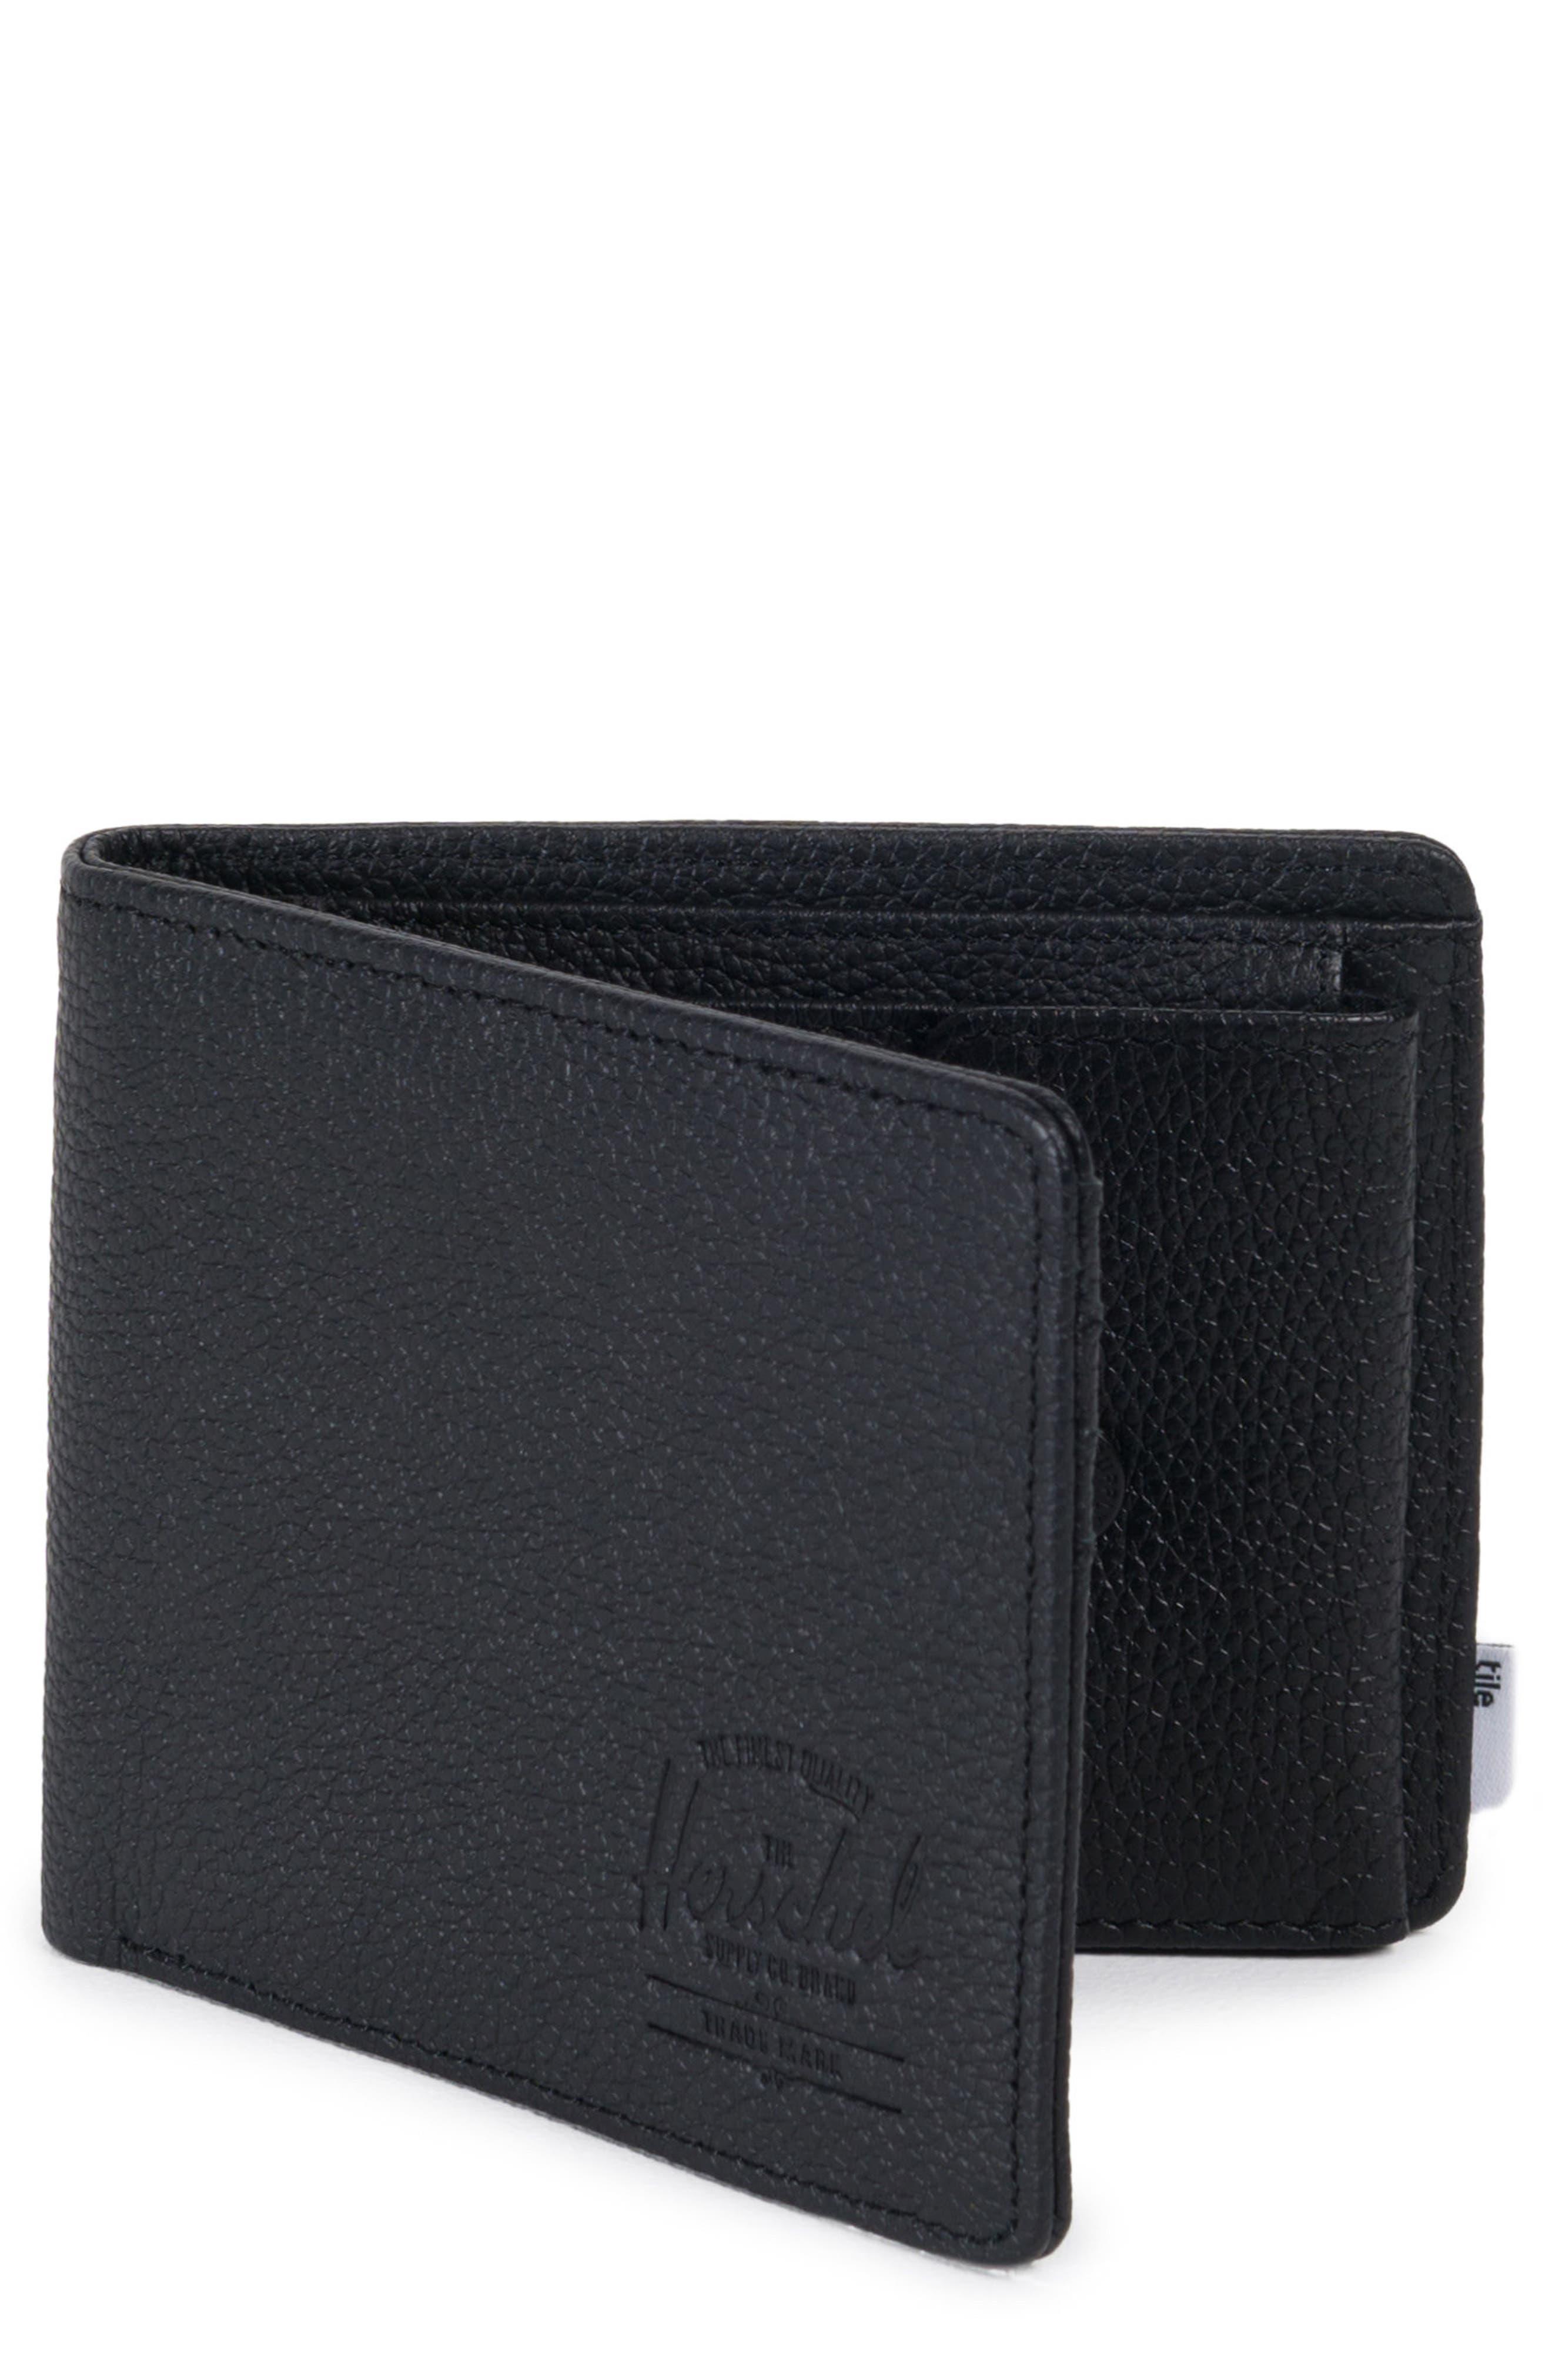 Tile Roy Leather Wallet,                             Main thumbnail 1, color,